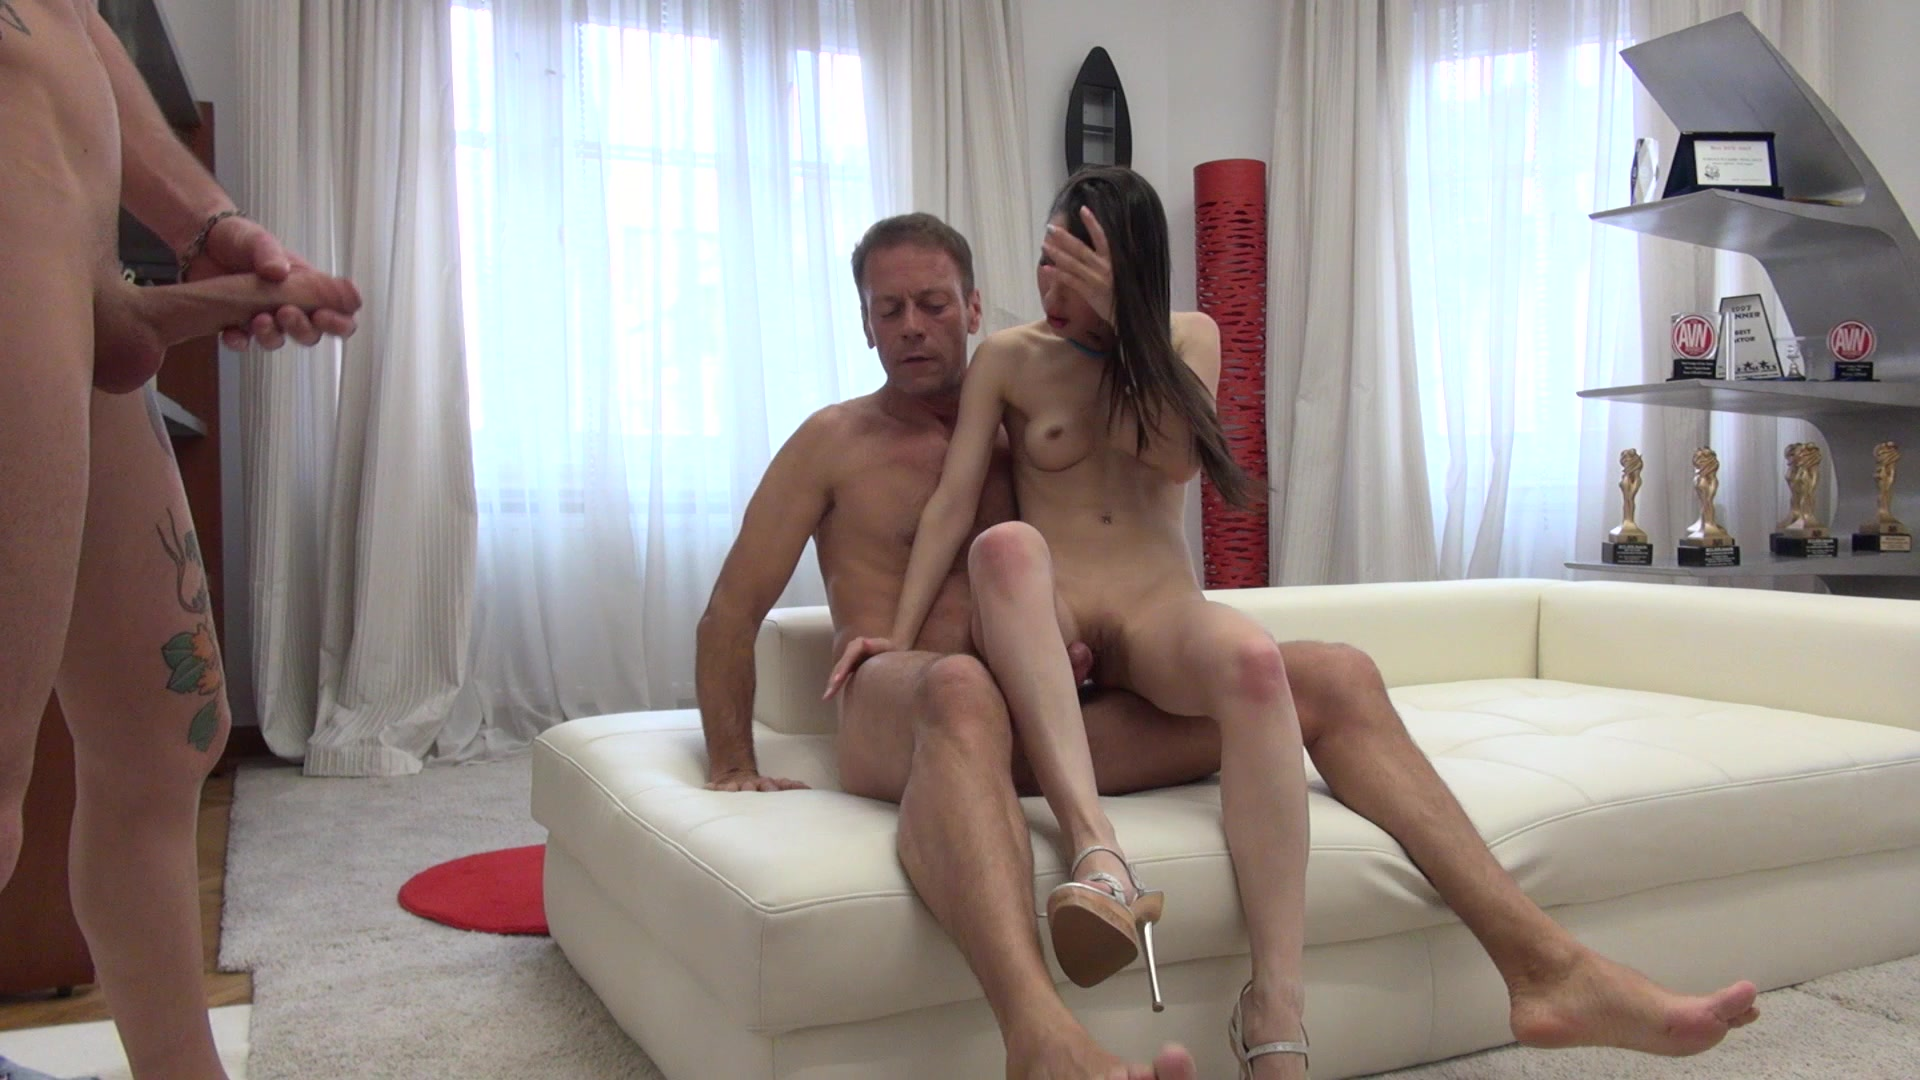 Русской порноактрисе Джине Джерсон раздолбали жопу на кастинге Рокко Сиффреди смотреть онлайн